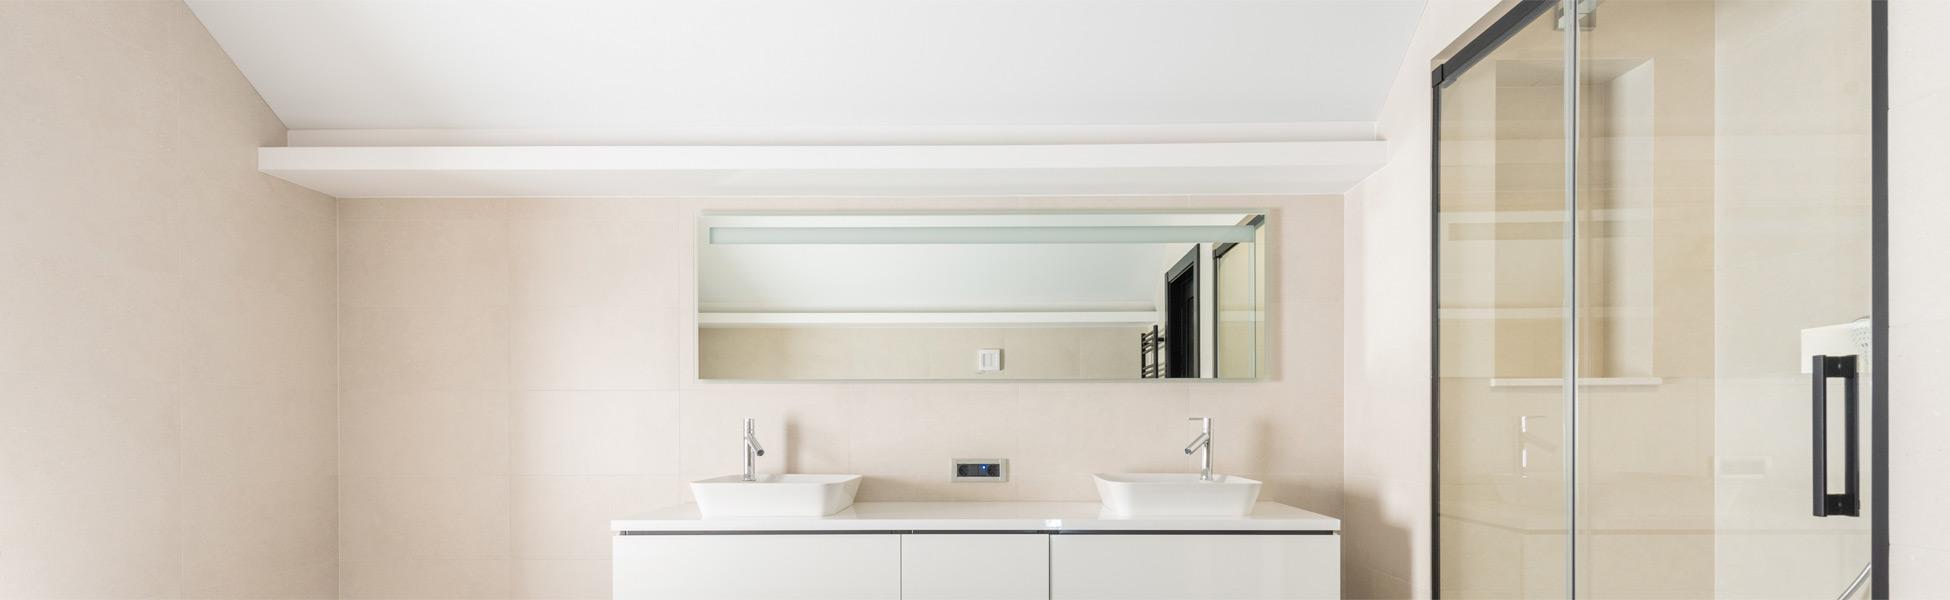 Custom Glass & Mirrors